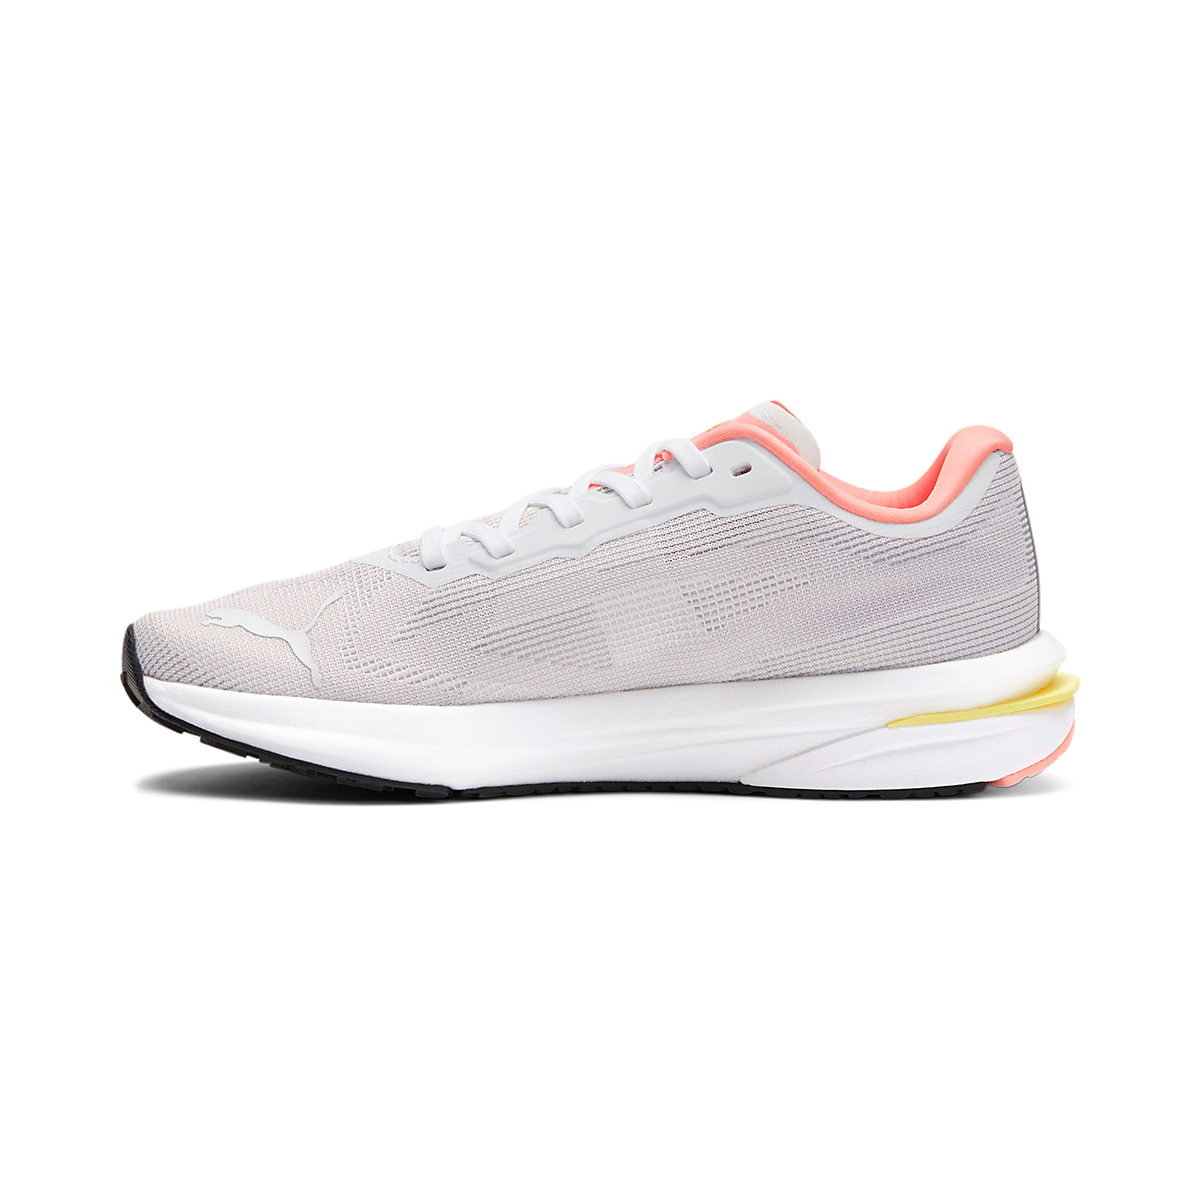 Women's Puma Velocity Nitro Running Shoe - Color: Puma White - Size: 5.5 - Width: Regular, Puma White, large, image 2